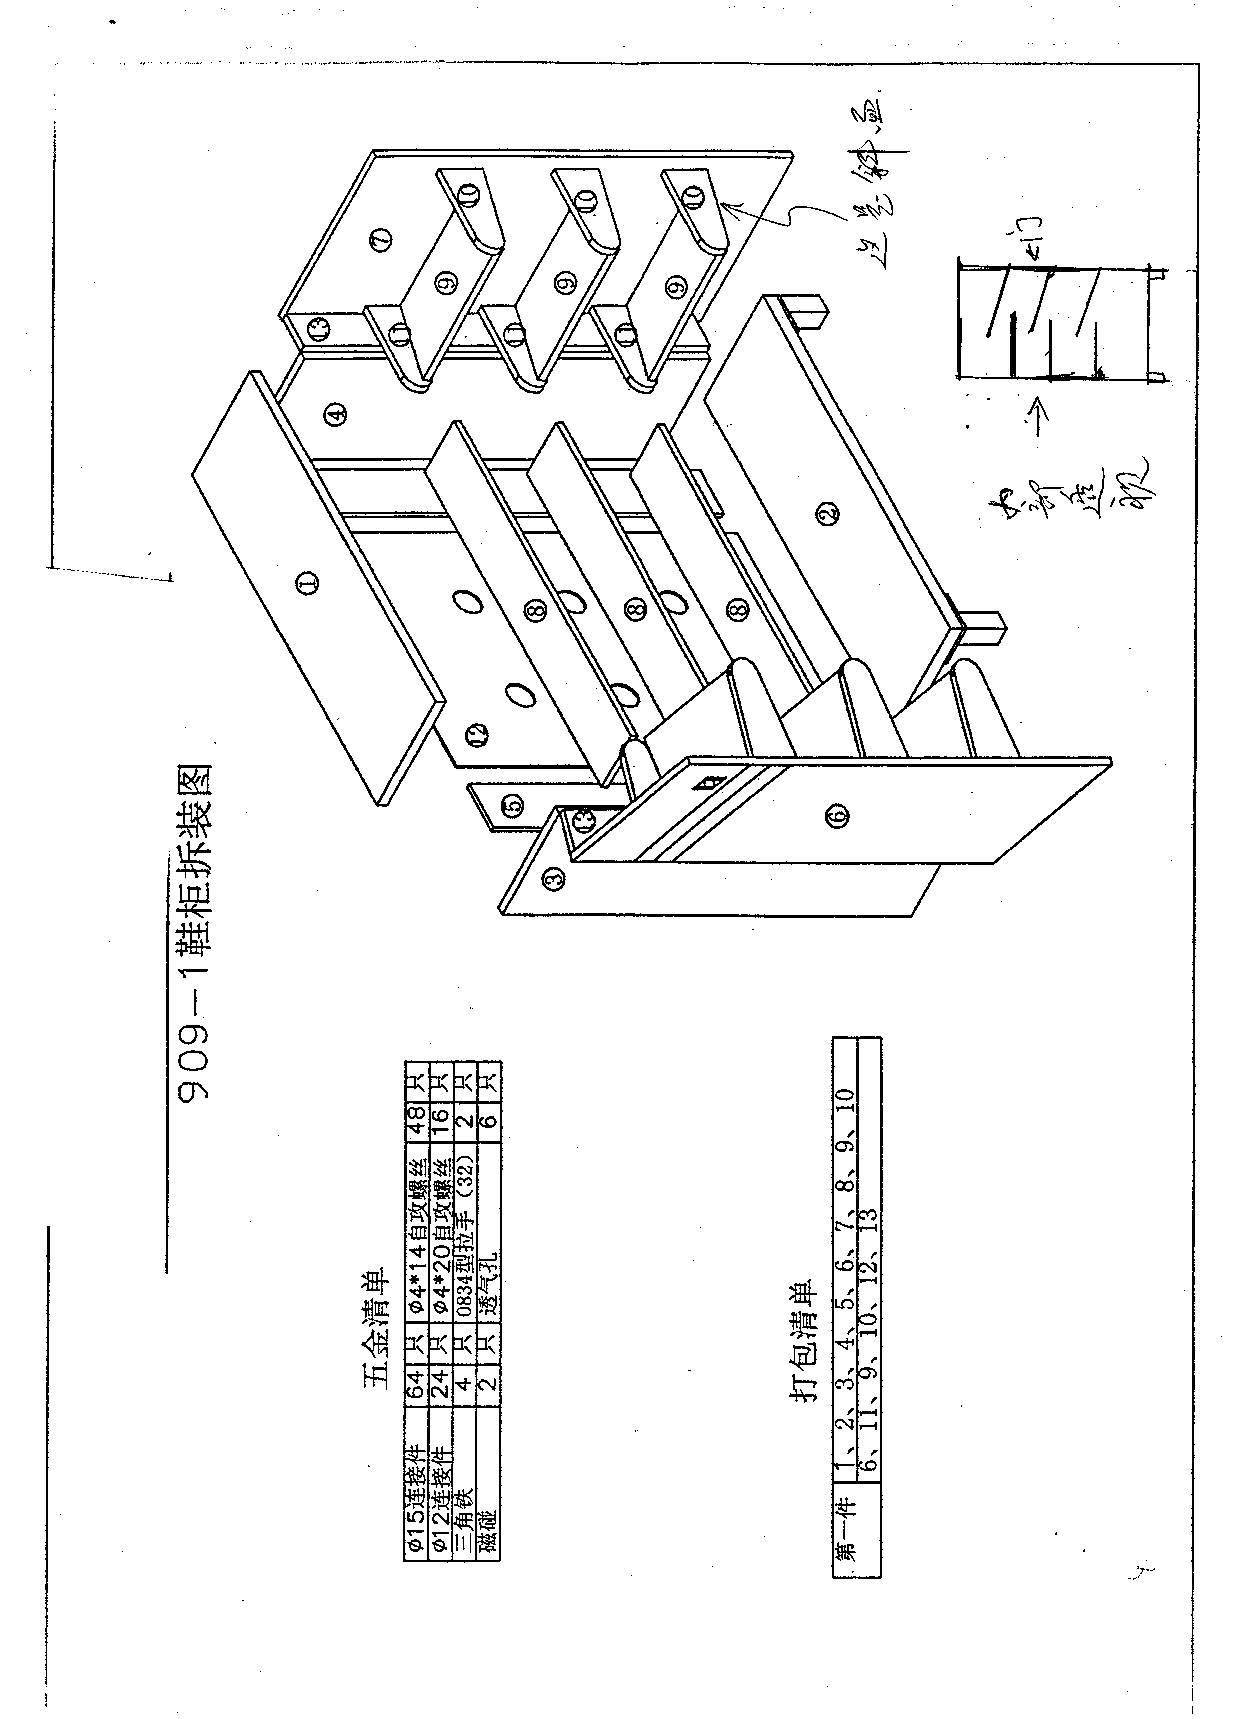 Installation Diagram Office Furniture Melbourne